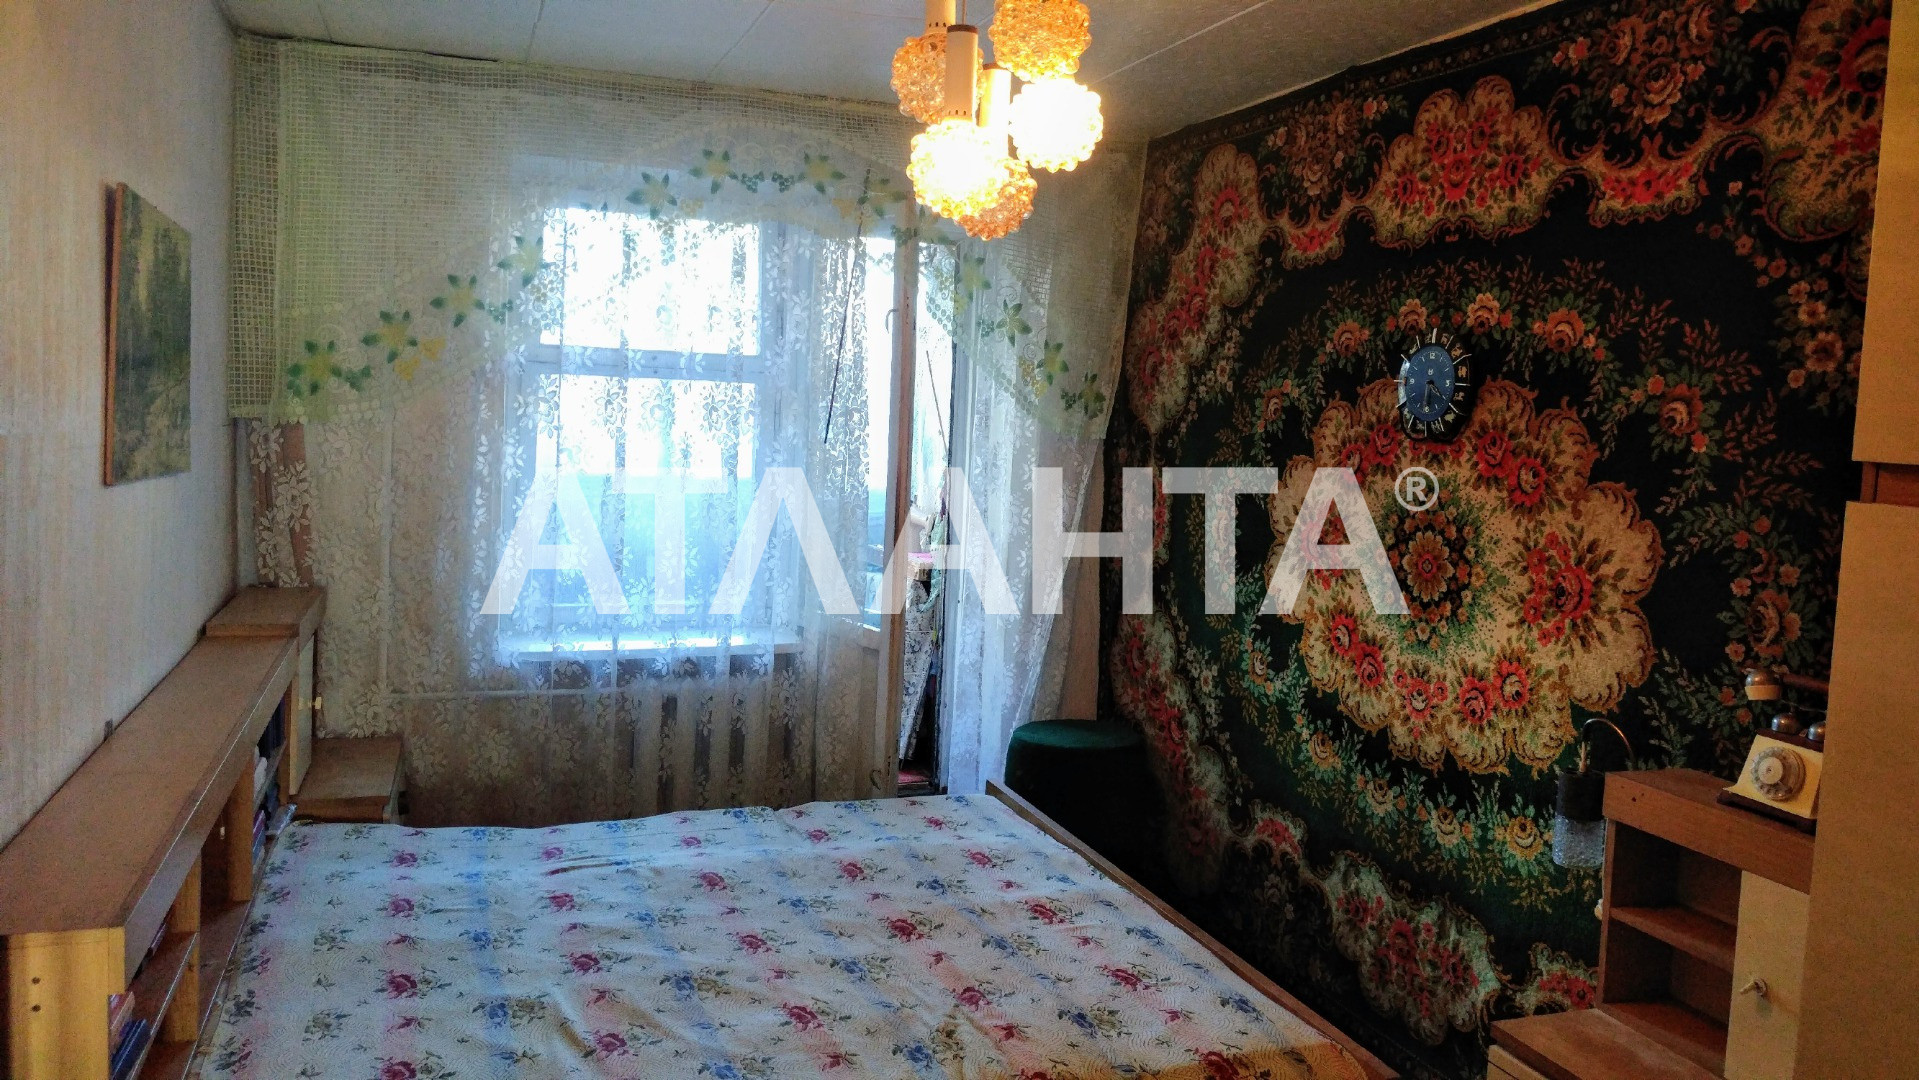 Продается 3-комнатная Квартира на ул. Леваневского Пер. — 45 000 у.е. (фото №5)